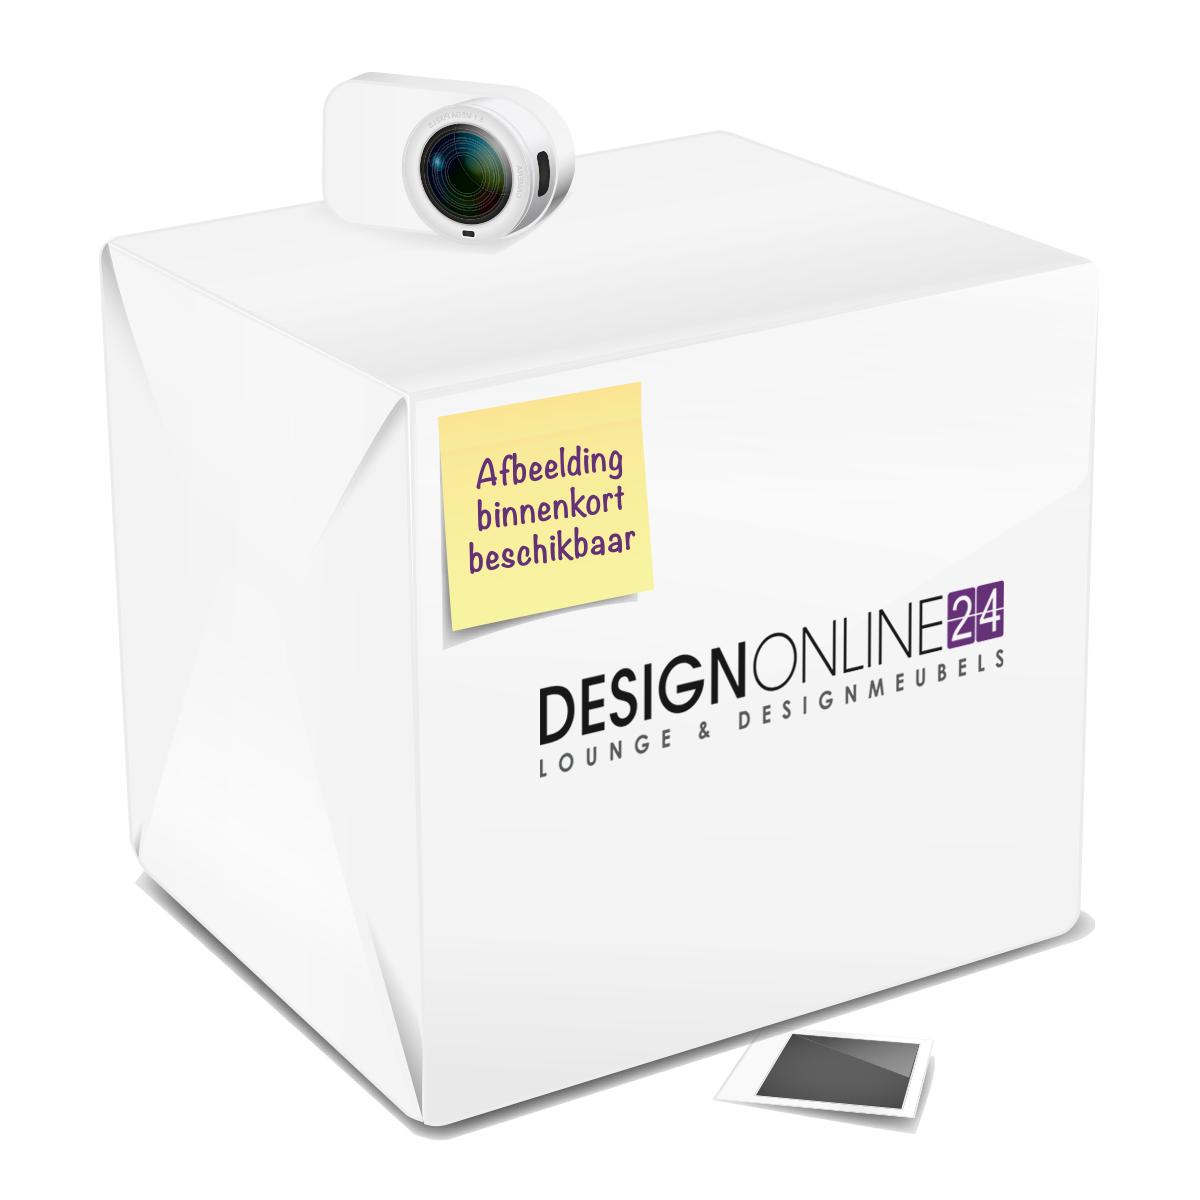 Zuiver stoel OMG LL Bruin kunstleer - DesignOnline24